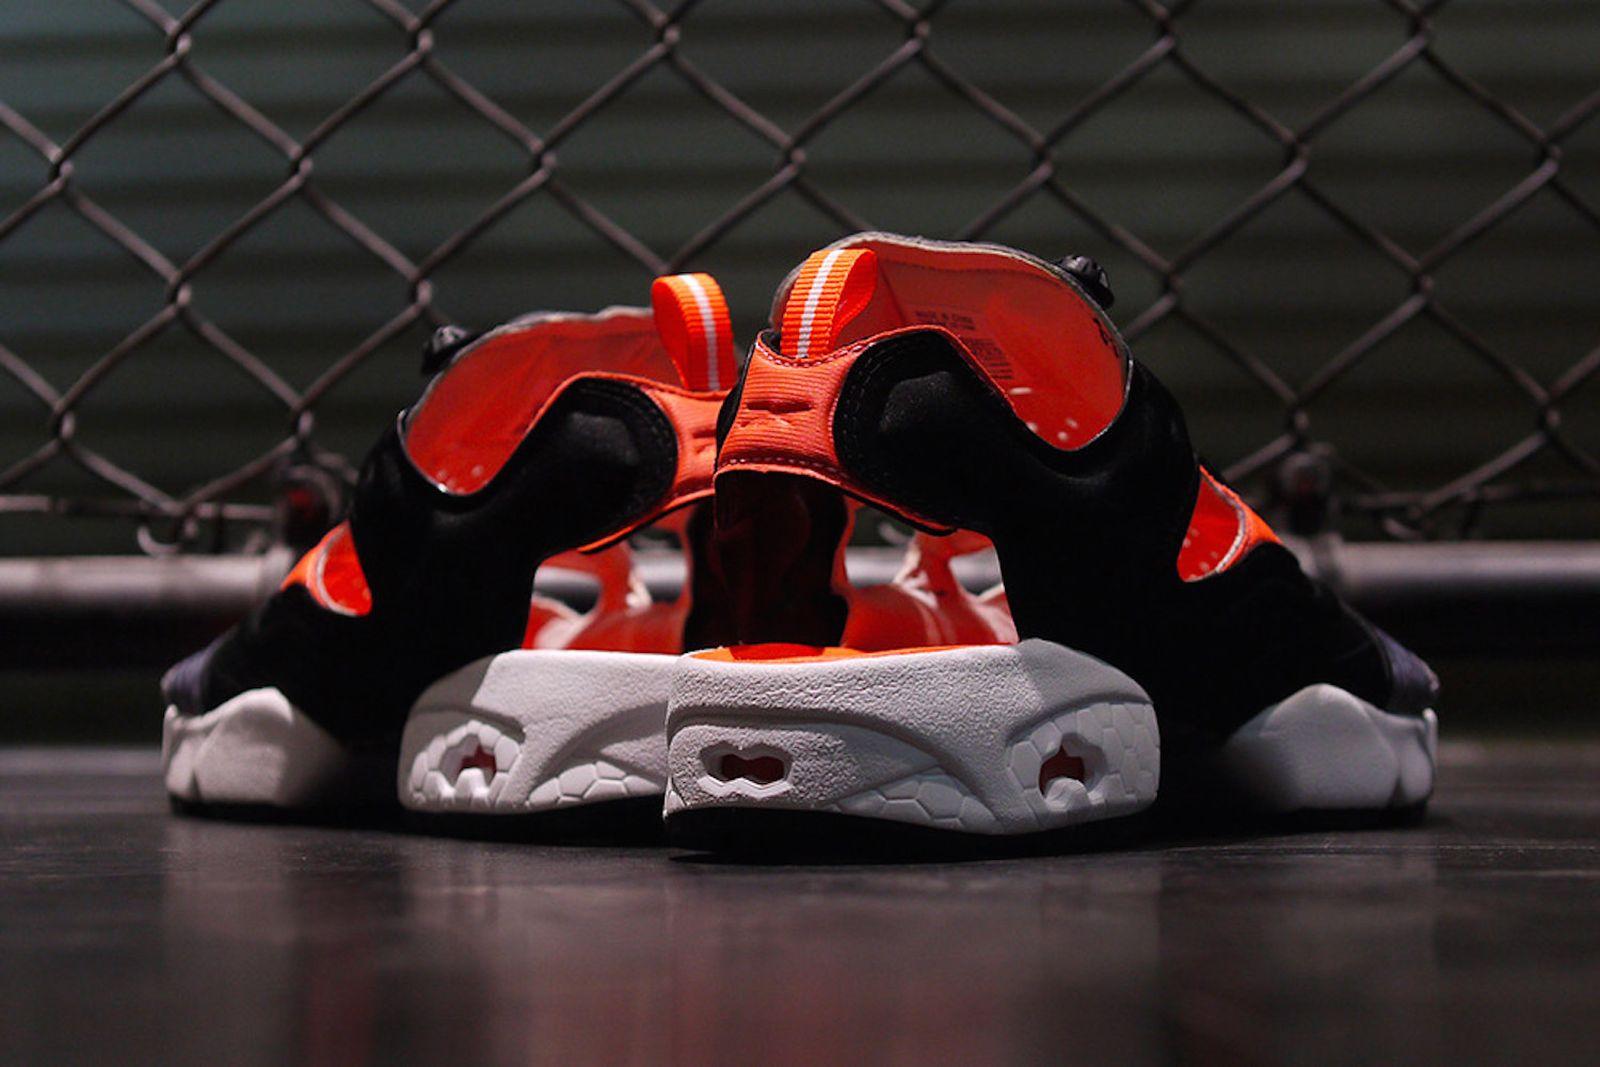 mita sneakers whiz limited reebok instapump fury sandal release date price info